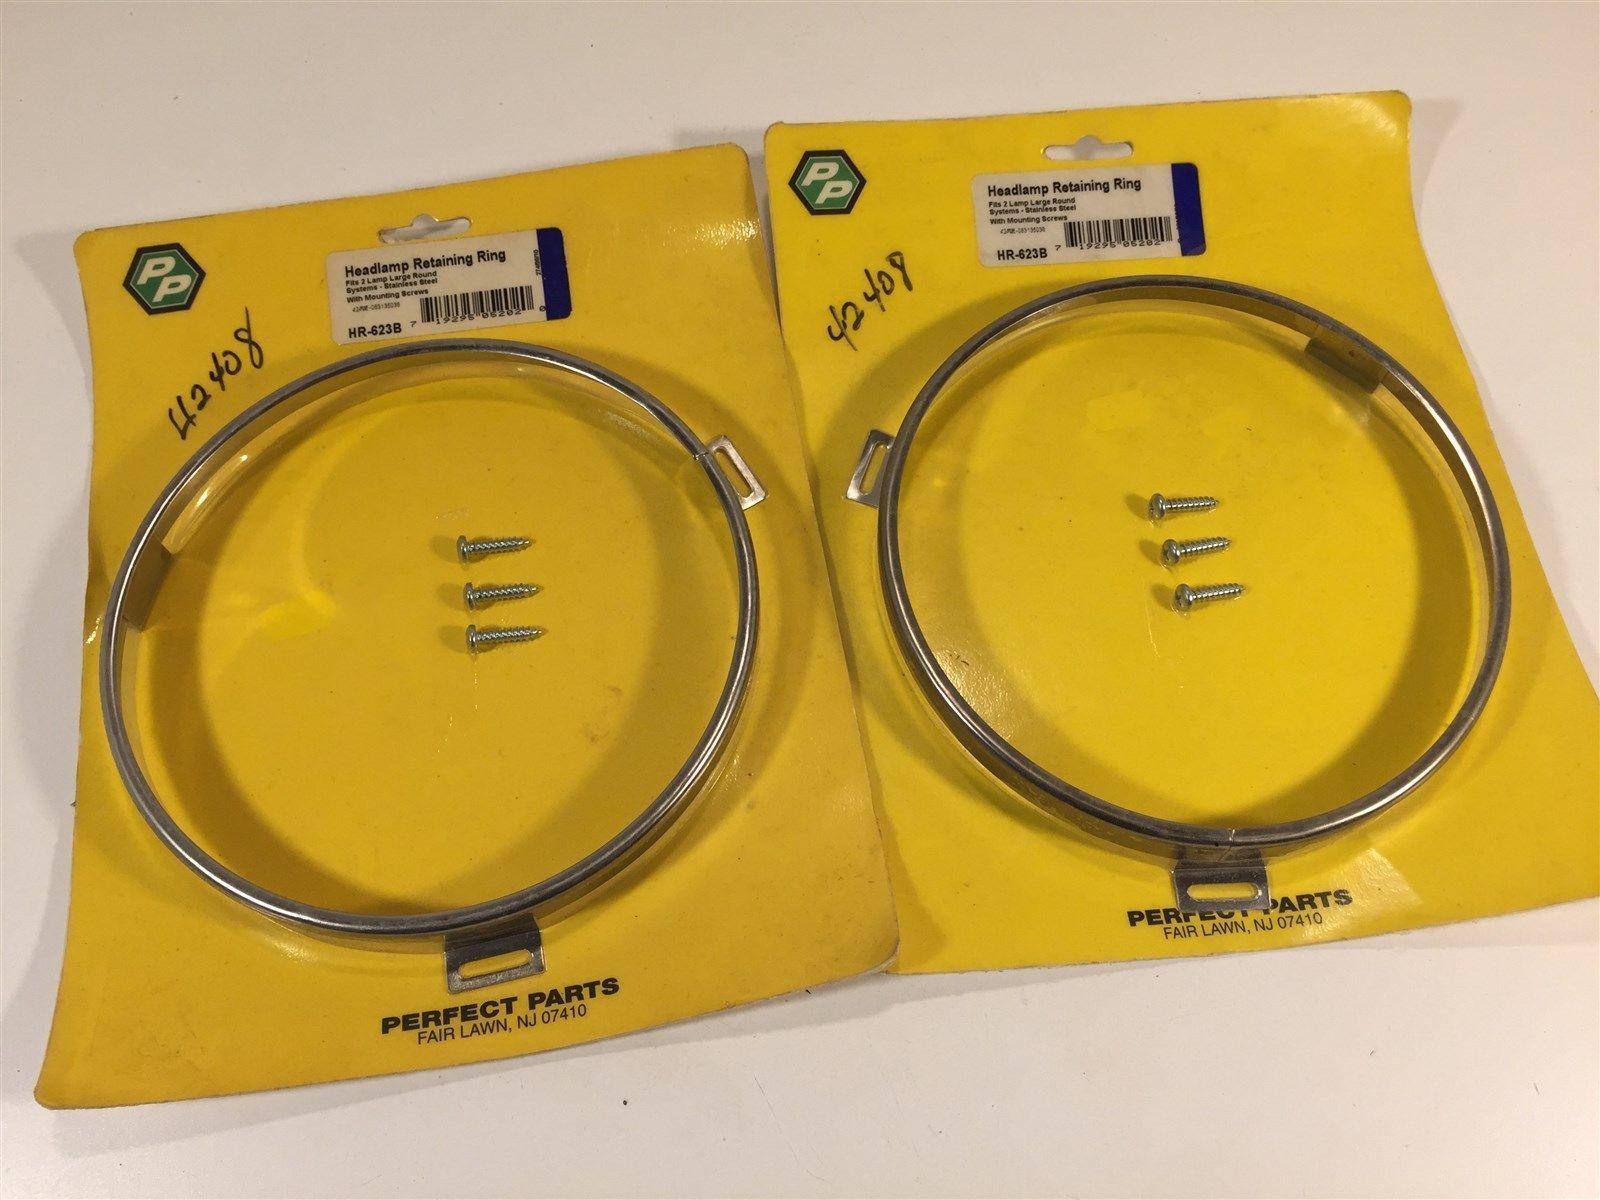 Perfect Parts 42408 Headlight Headlamp Ring HR-623B